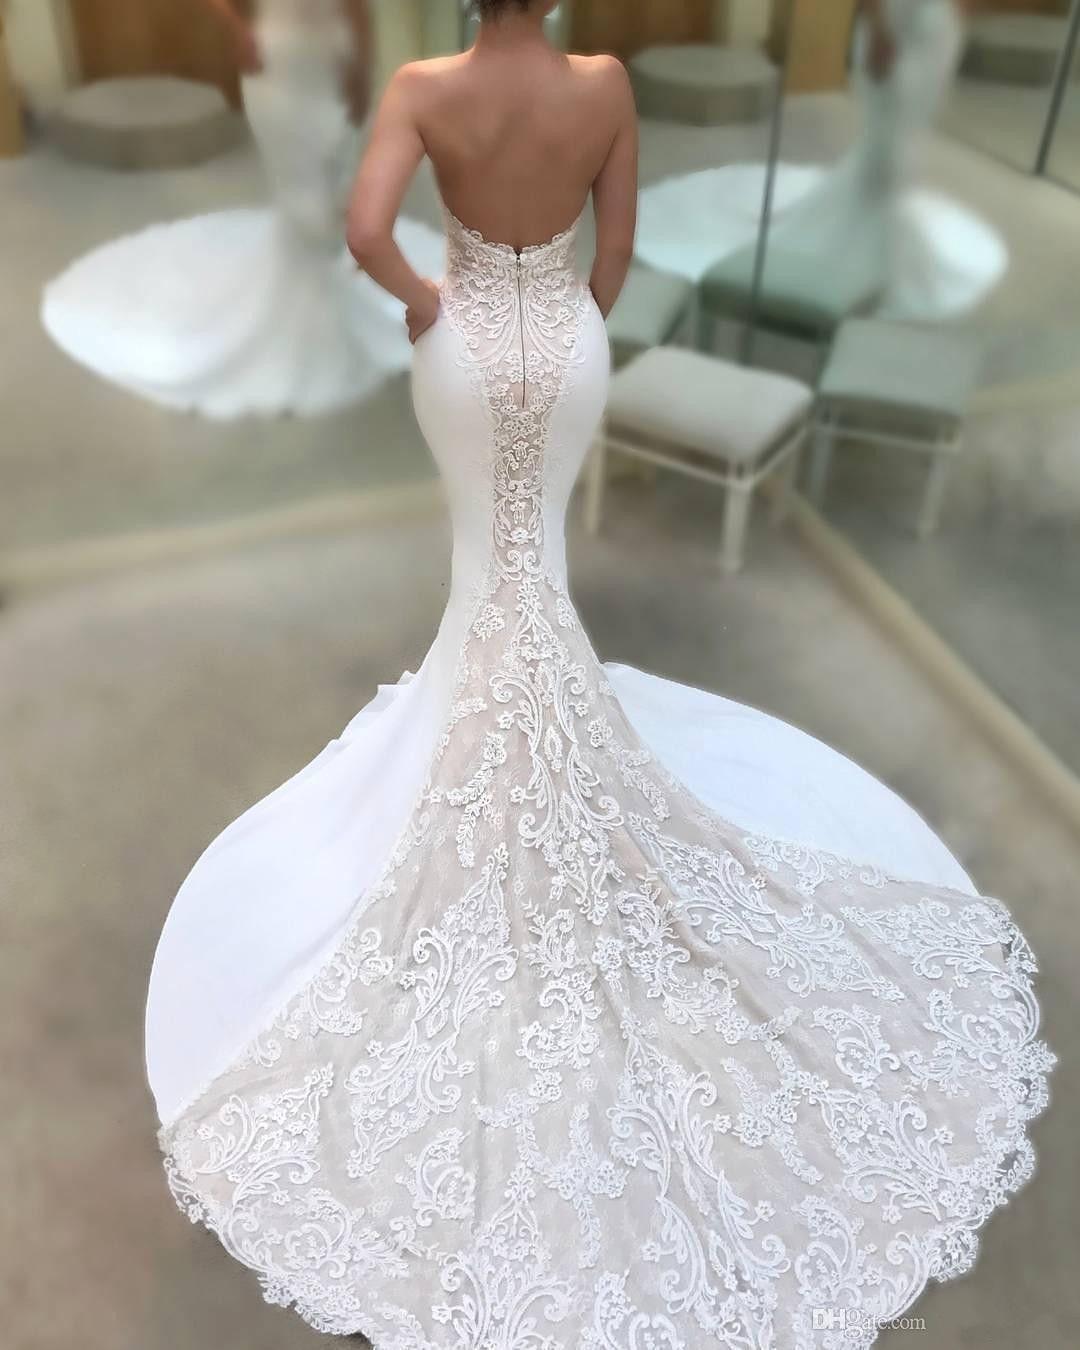 Berta 2018 Sexy Backless Mermaid Wedding Dresses Sweetheart Neckline Lace Appliqued Bridal Gowns Court Train Beach Wedding Dress